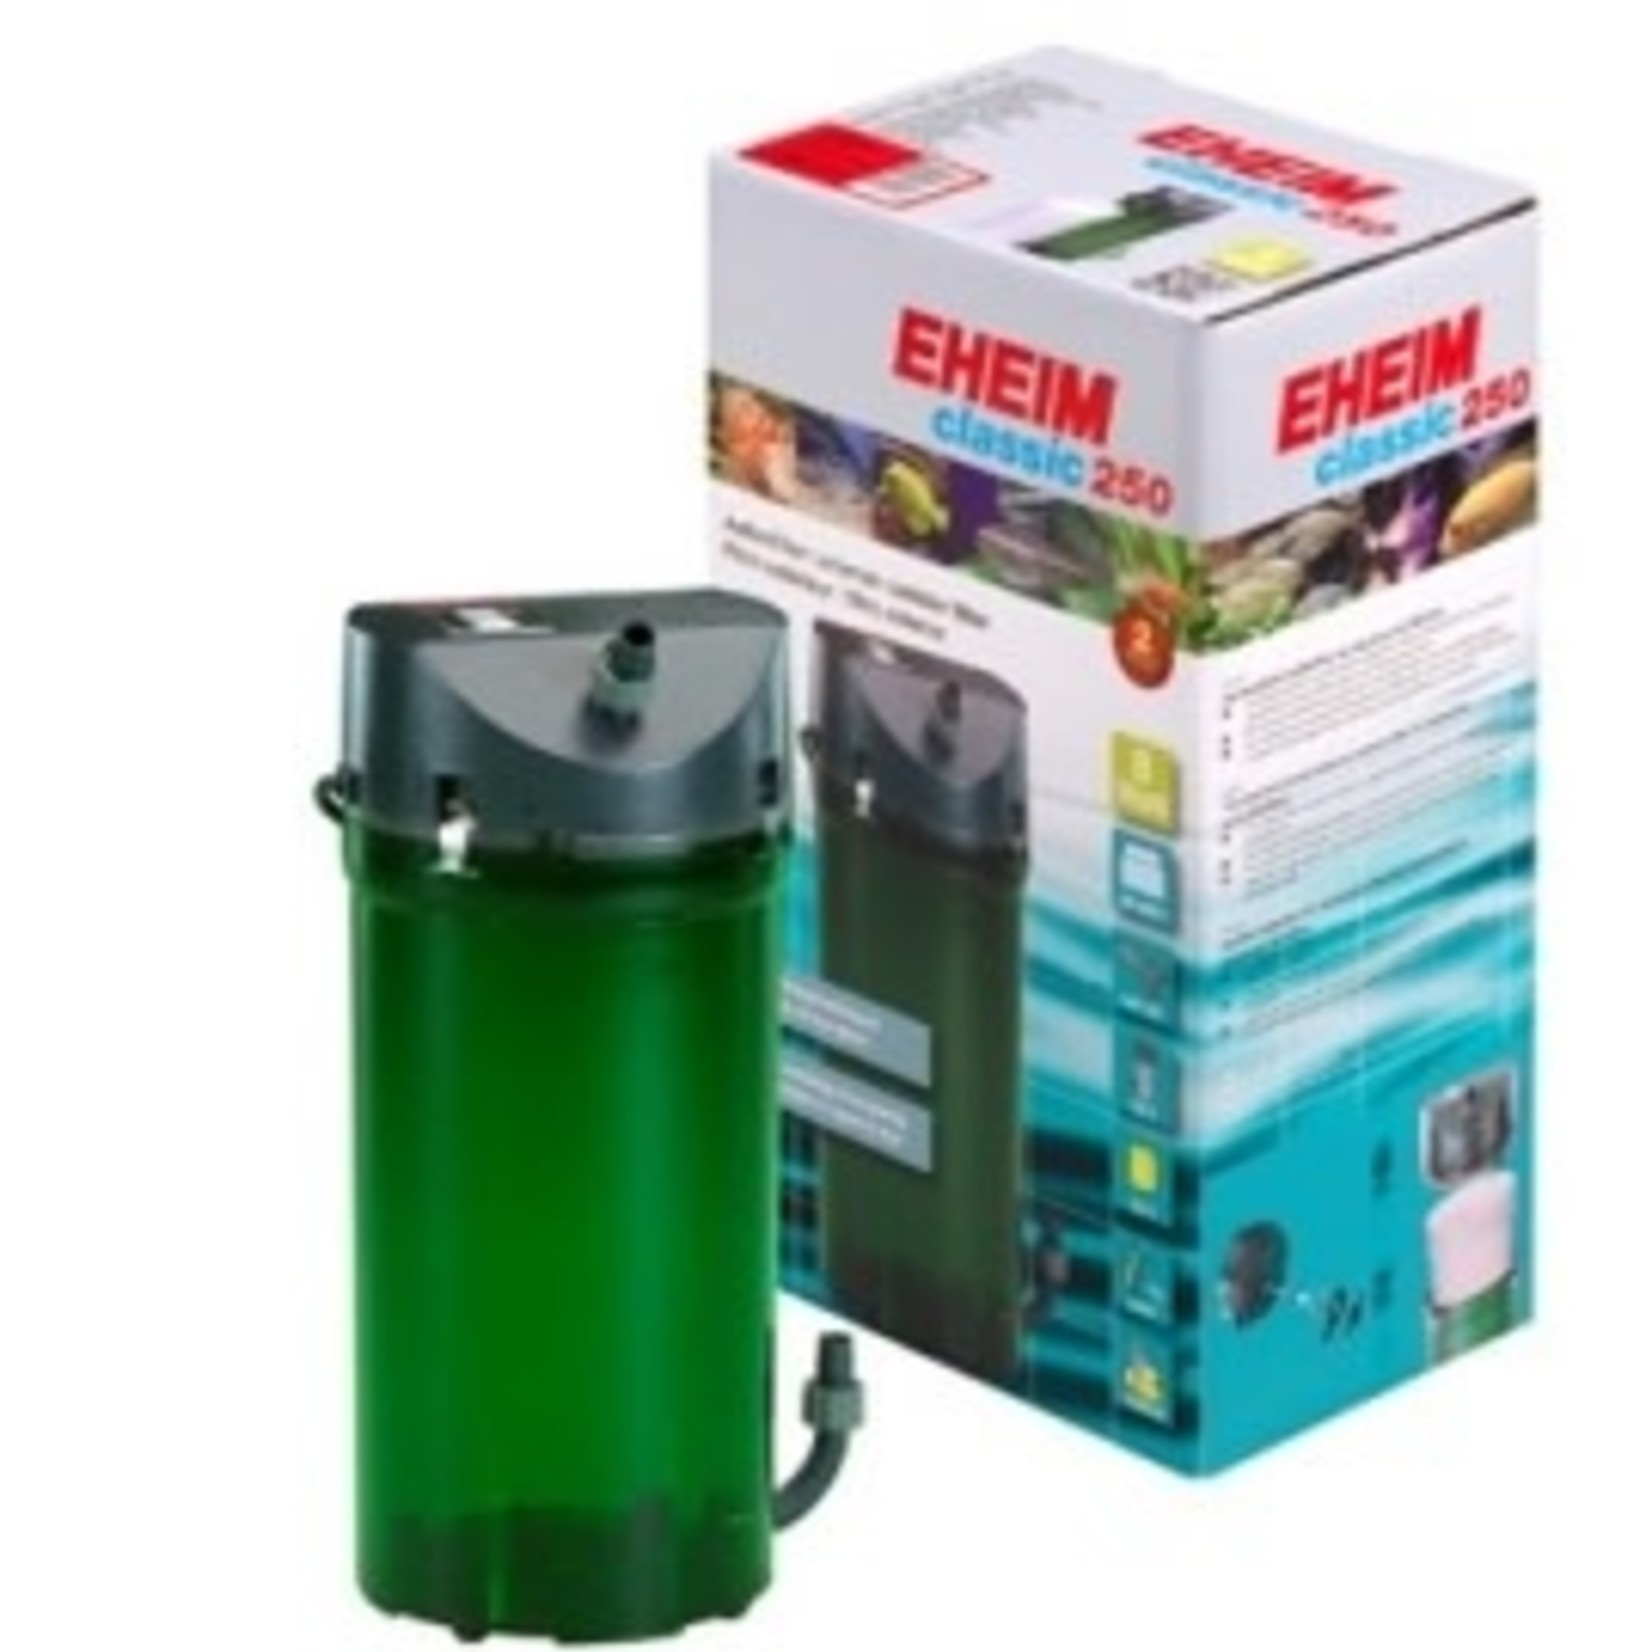 Eheim FILTRE CLASSIC 250 (2213) 440LH 250L